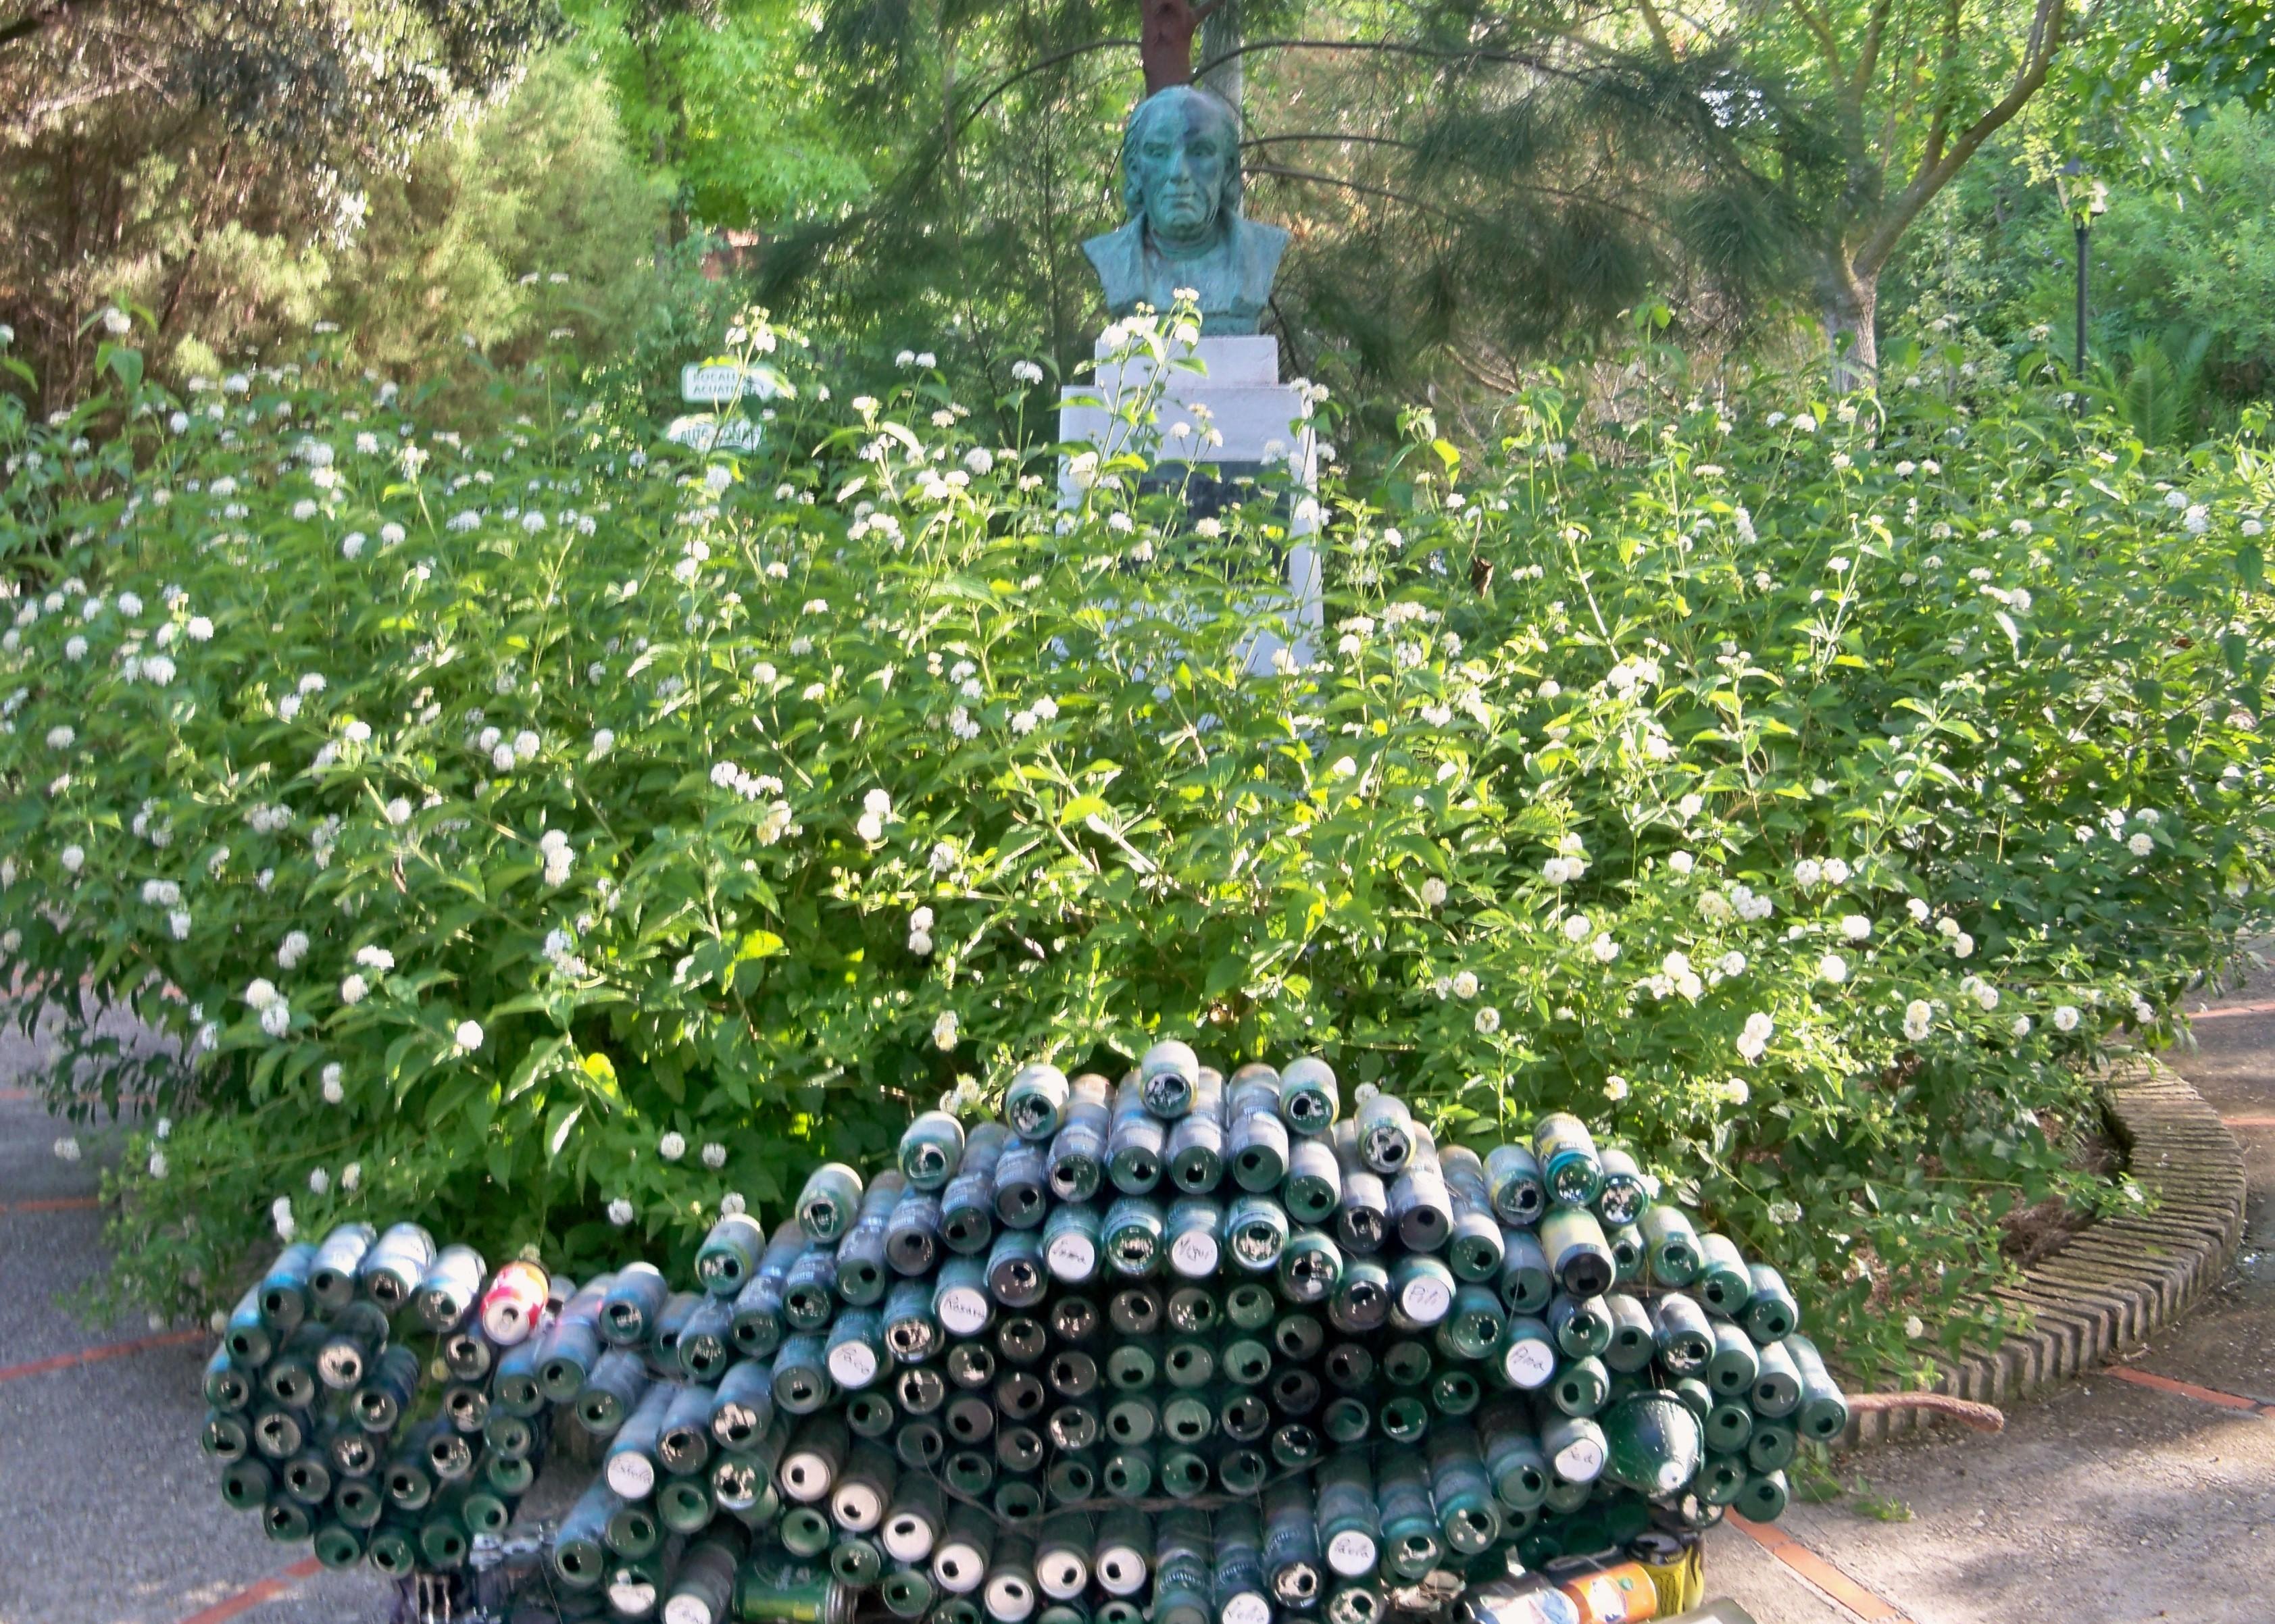 El Jardín Botánico José Celestino Mutis de Rota (Cádiz) | Asociación ...